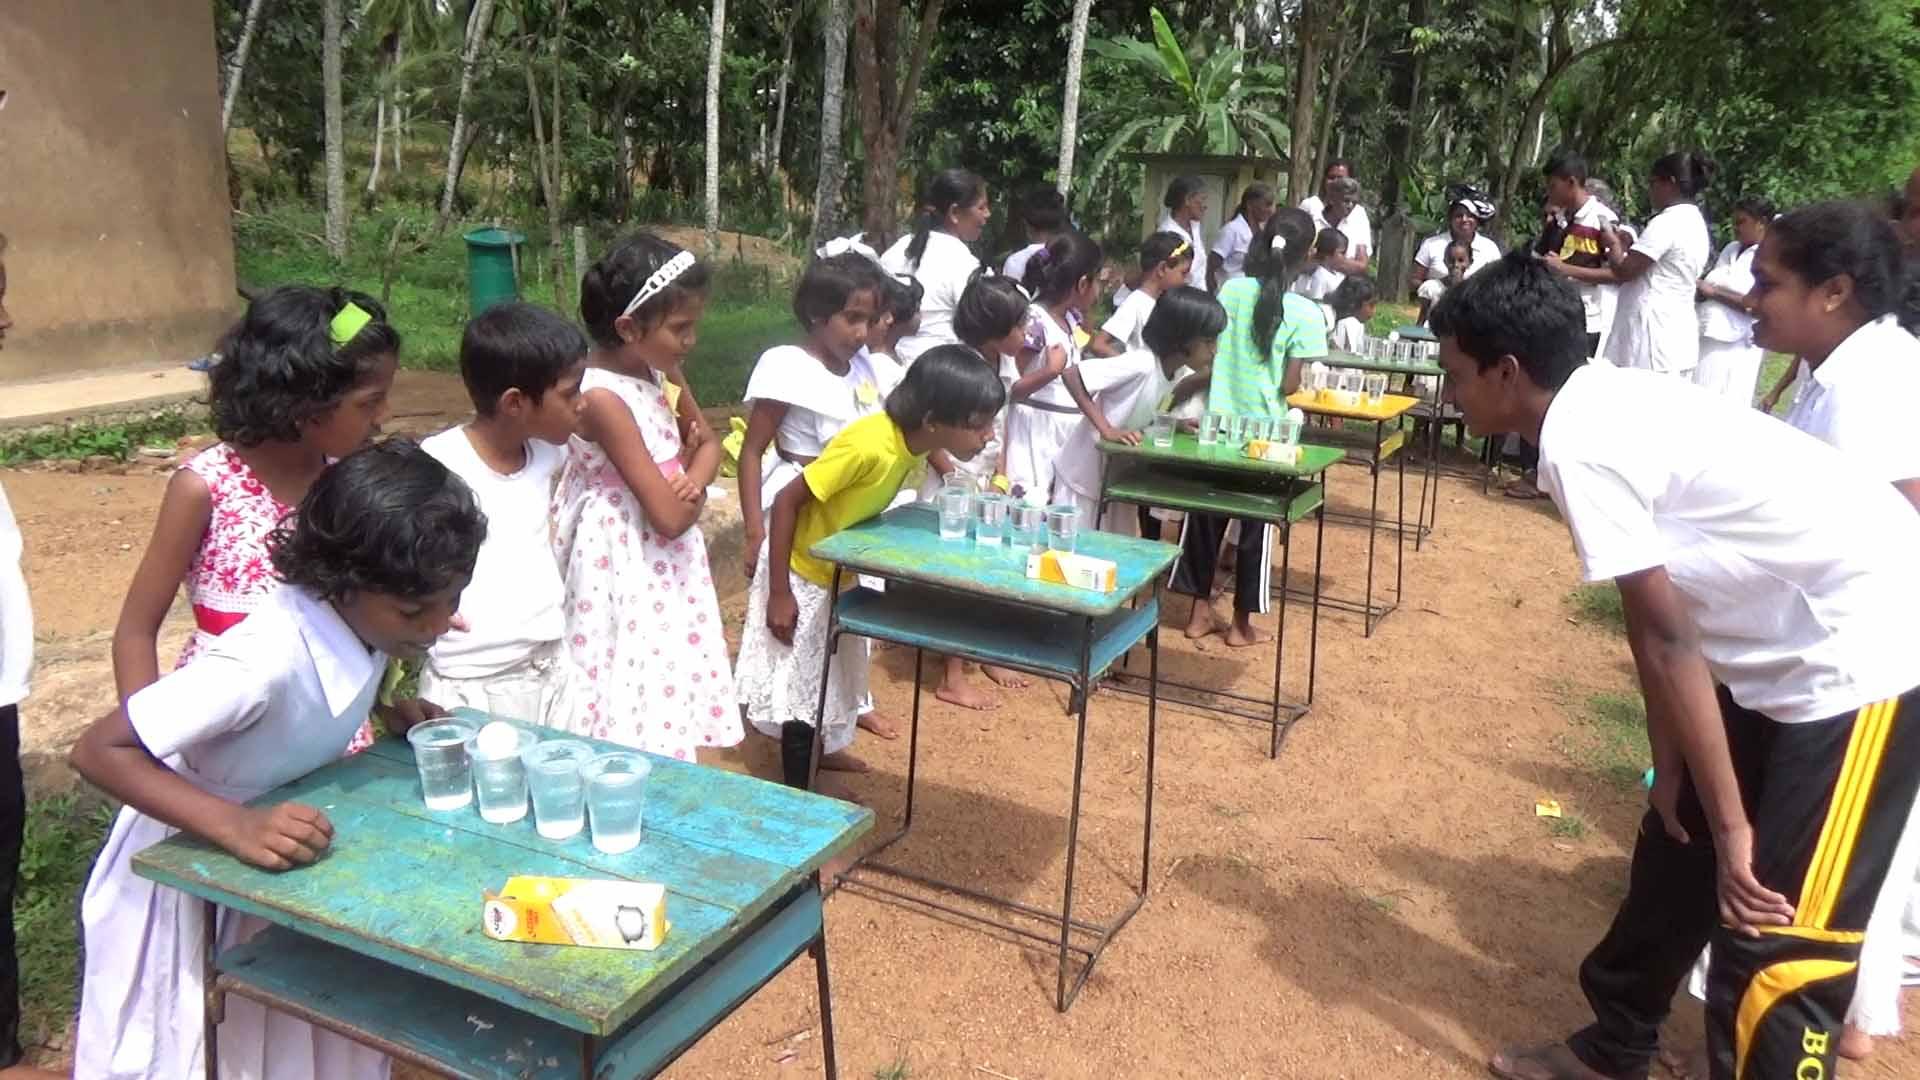 Sati Pasala Mindfulness Camp at Meethirigala Kanishta Vidyalaya-mindful games (1)